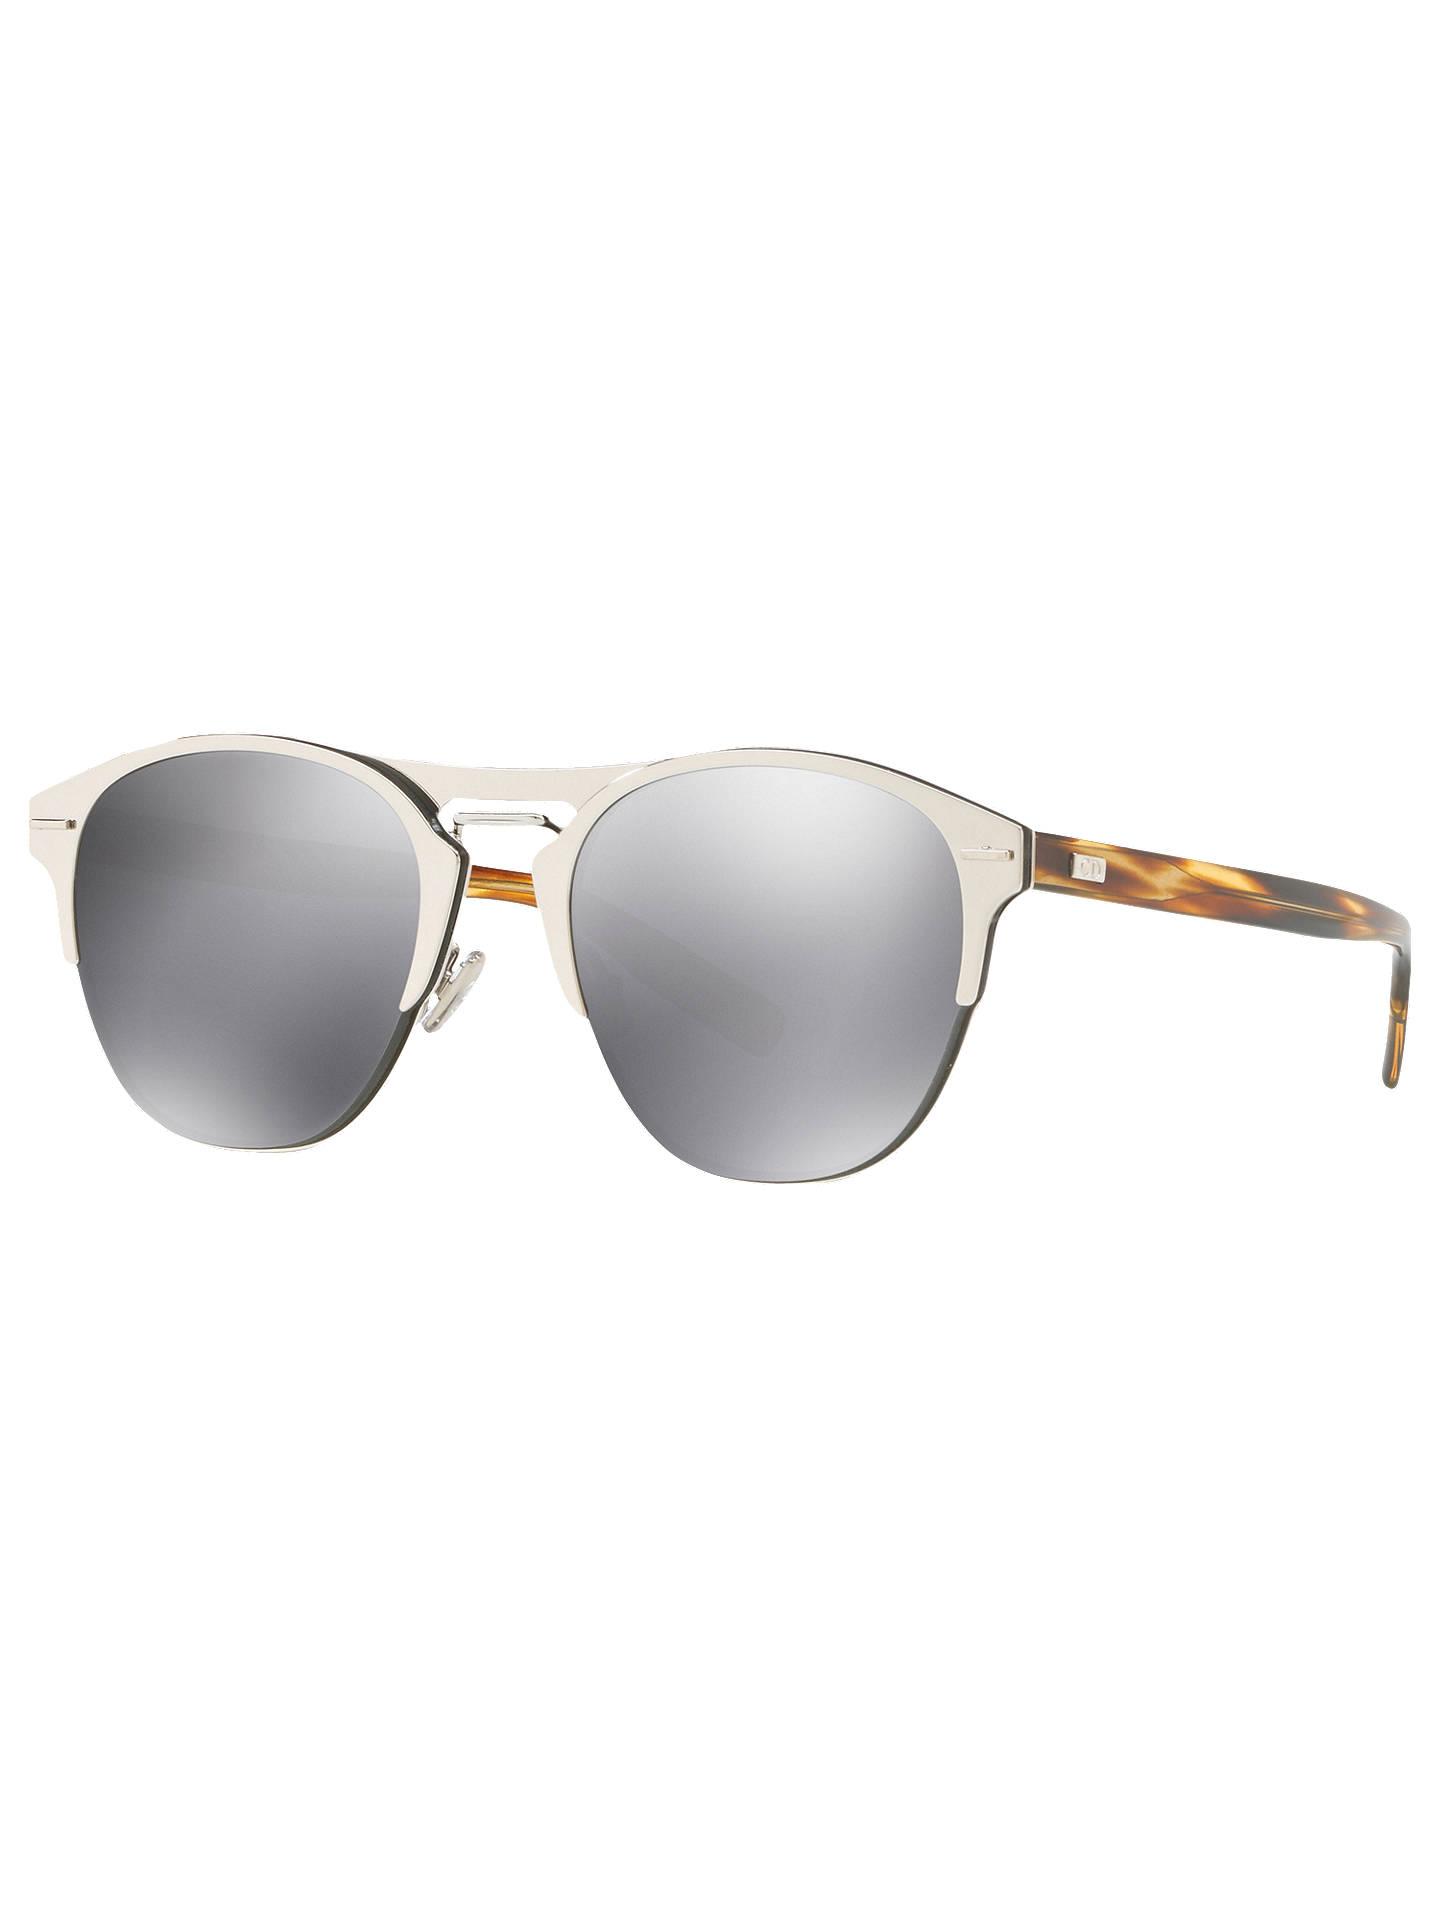 1f623d6d4ecb Dior DiorChrono Oval Sunglasses at John Lewis   Partners